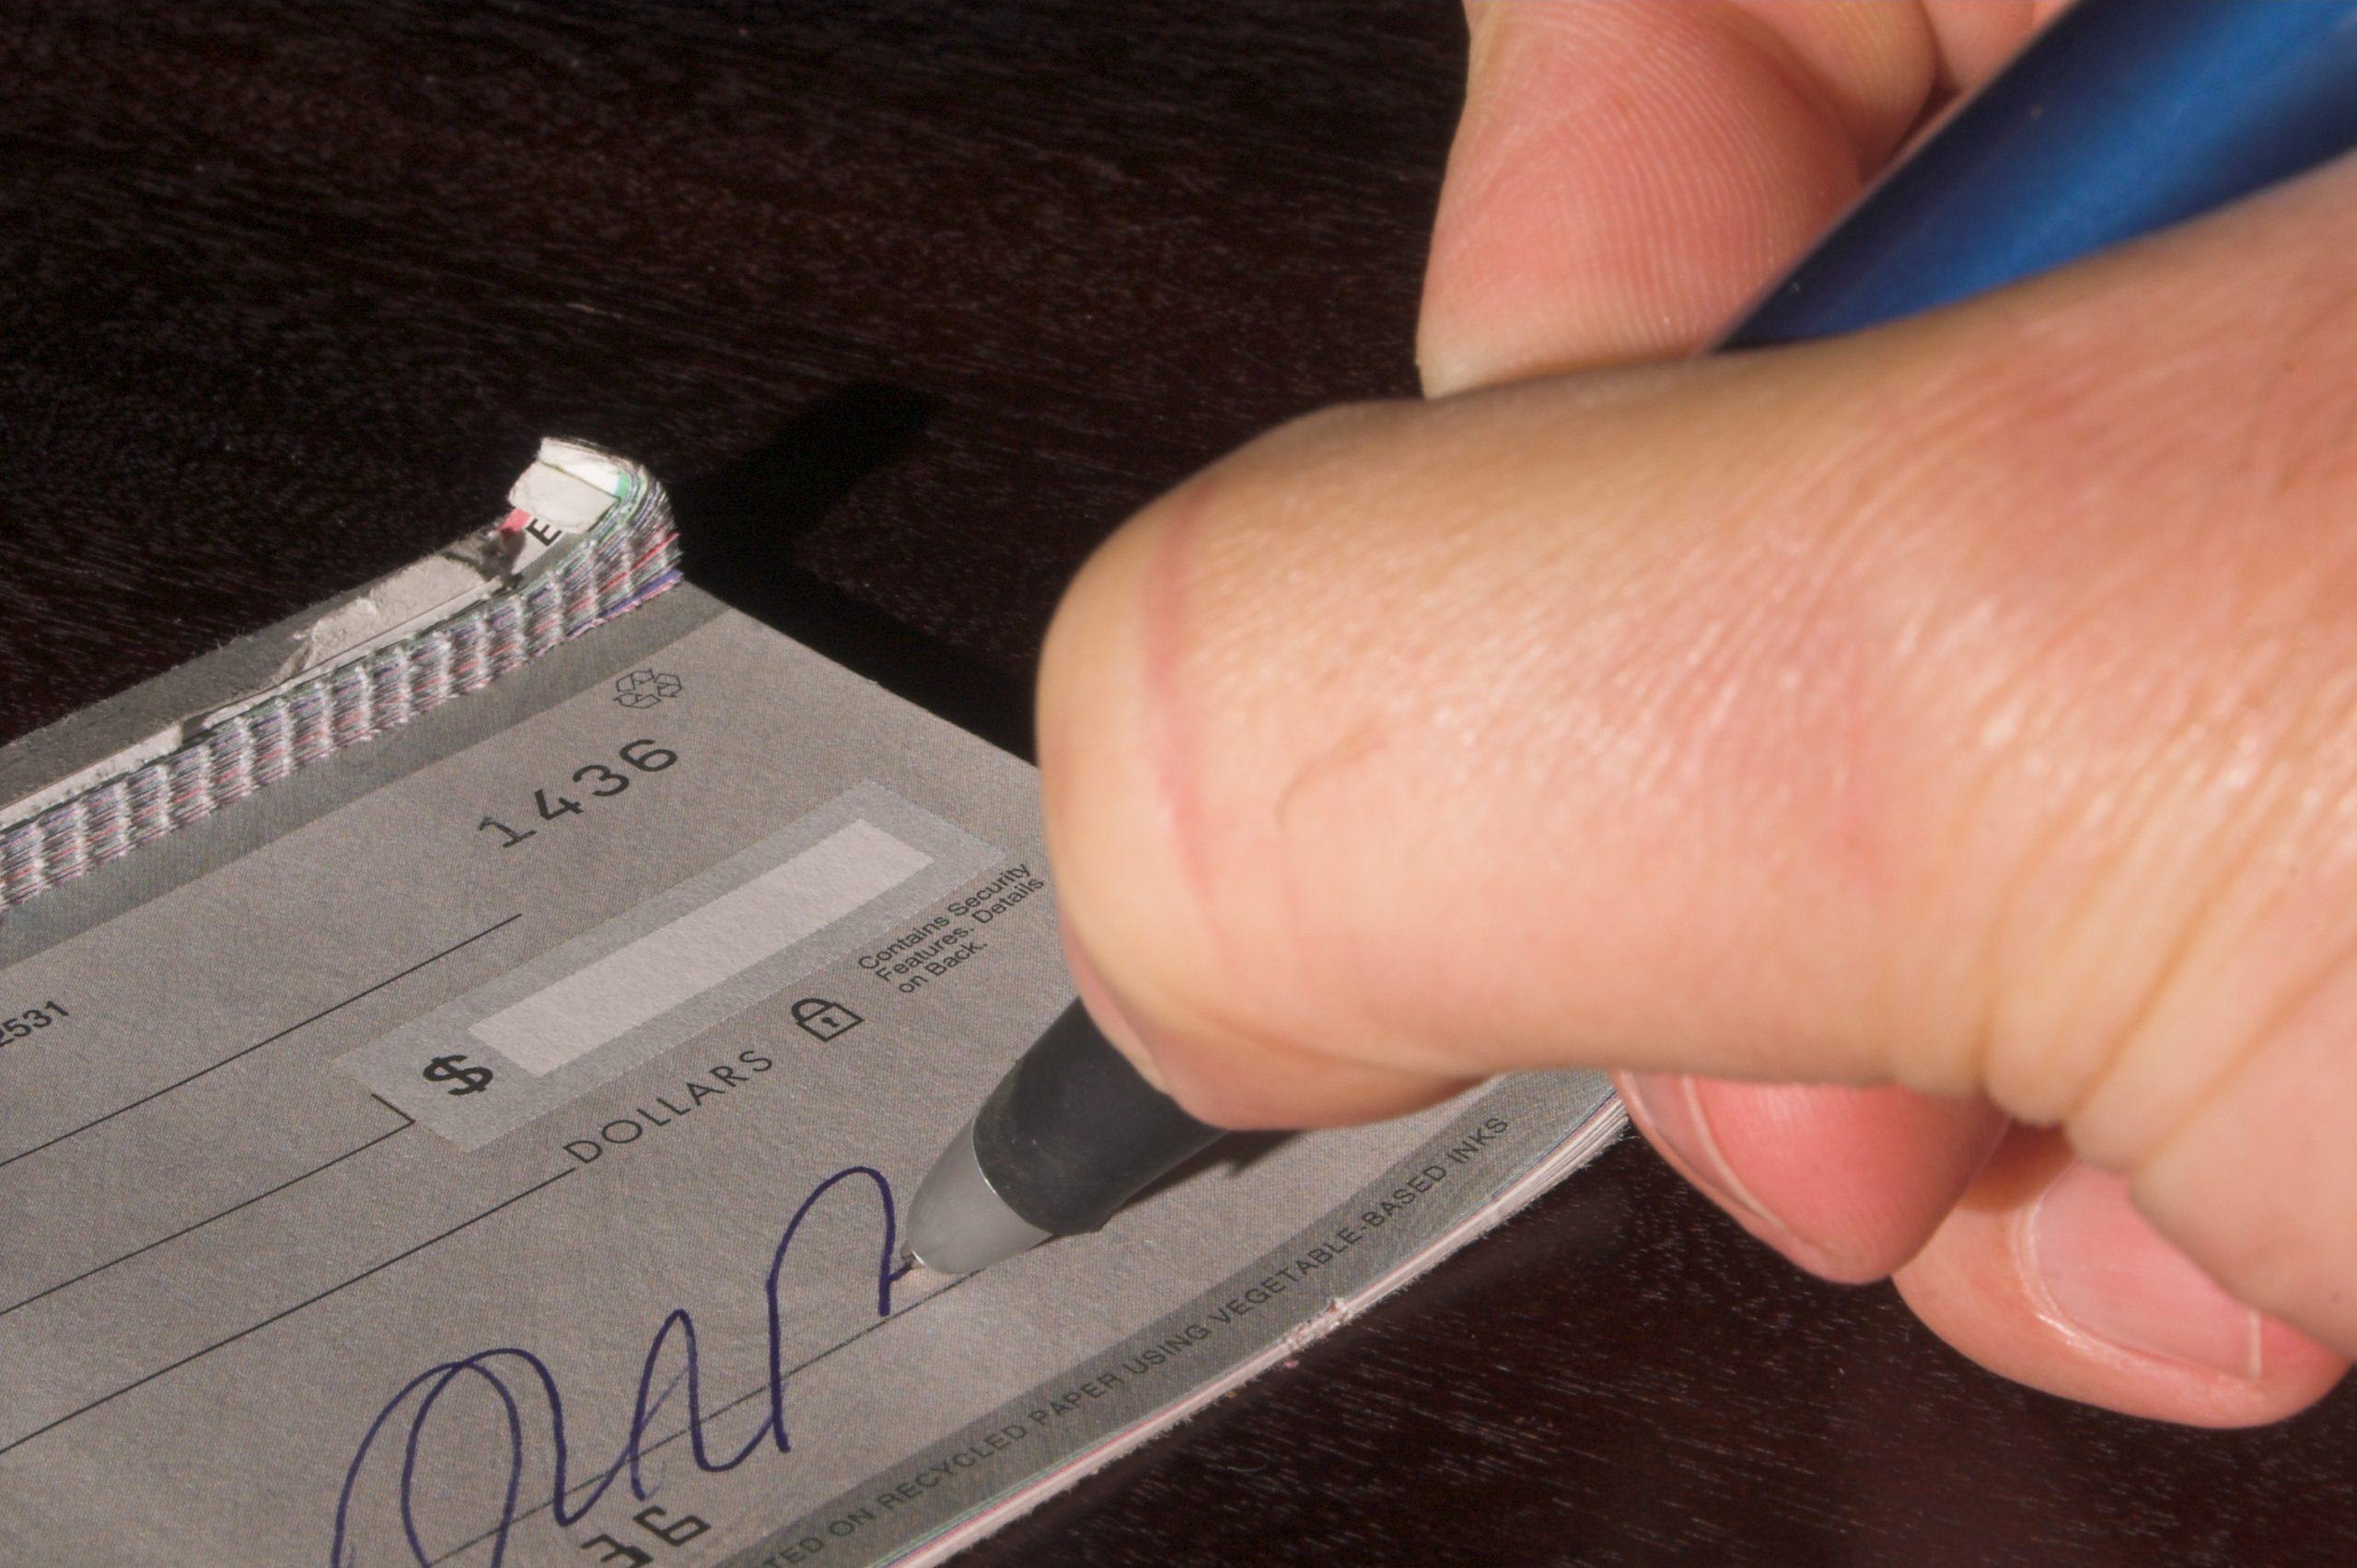 preventing check fraud